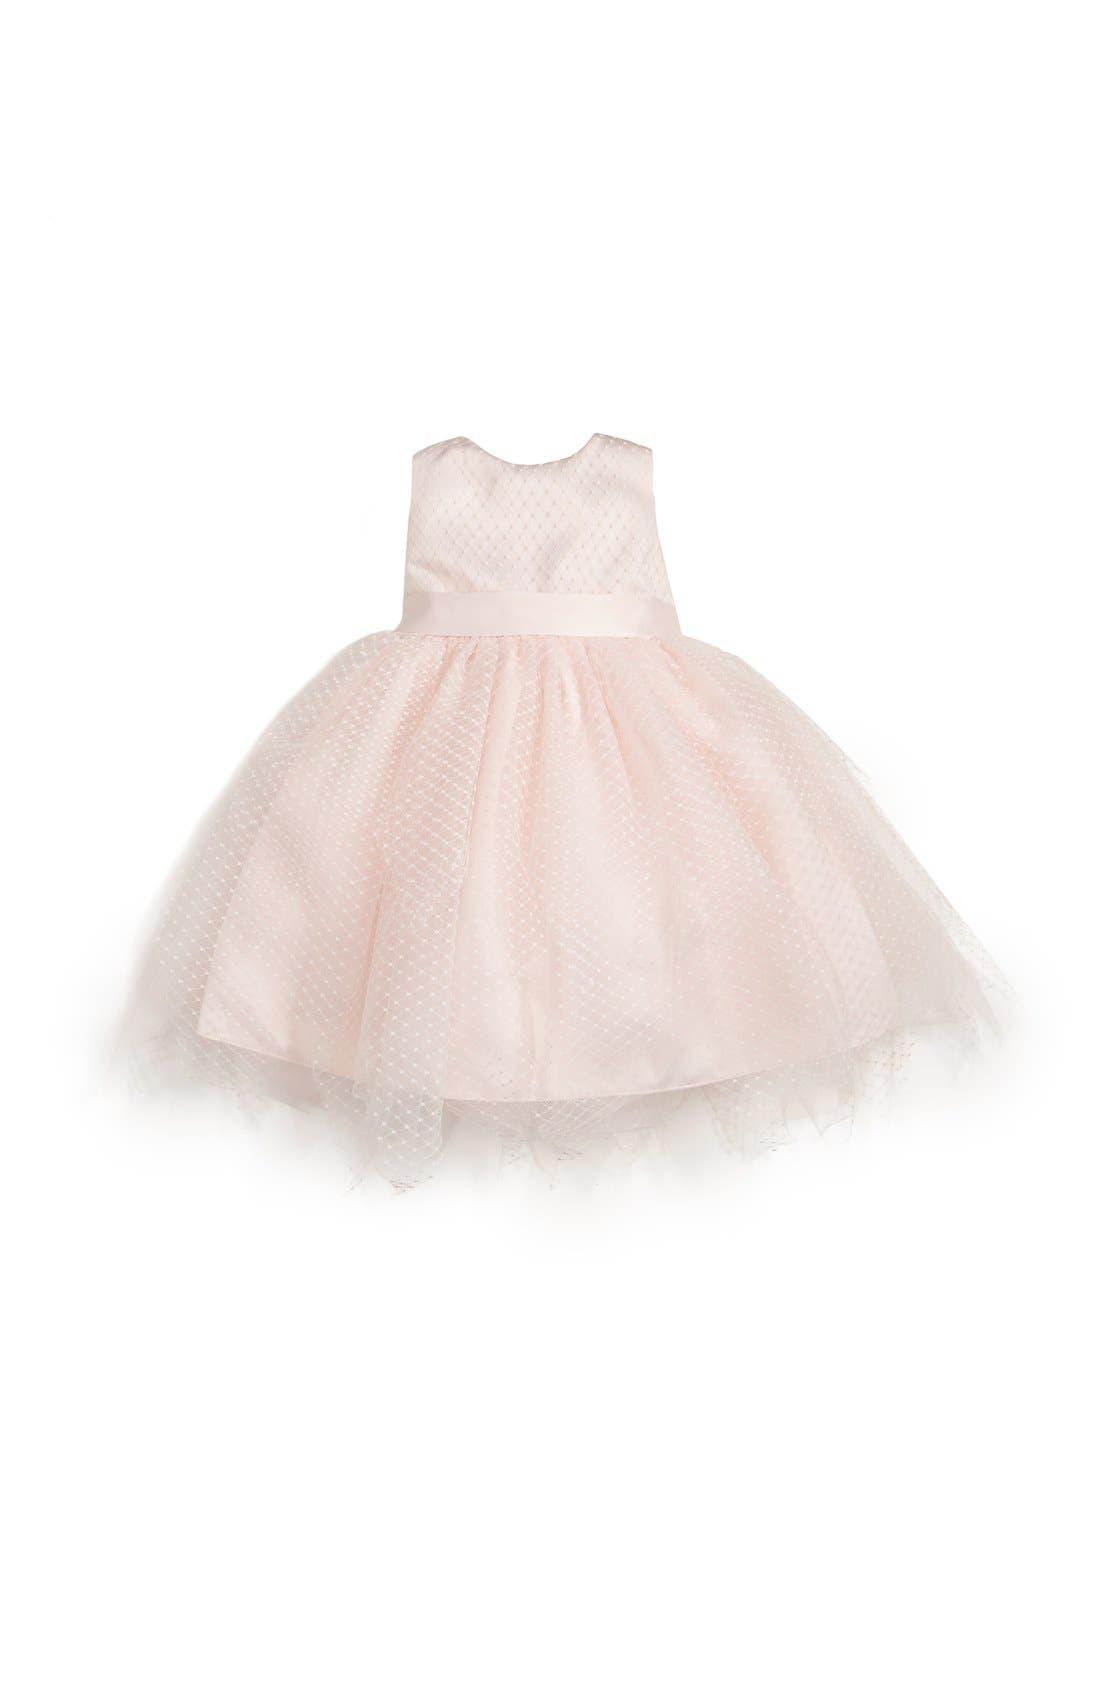 Tulle Overlay Sleeveless Dress,                         Main,                         color, Blush Pink